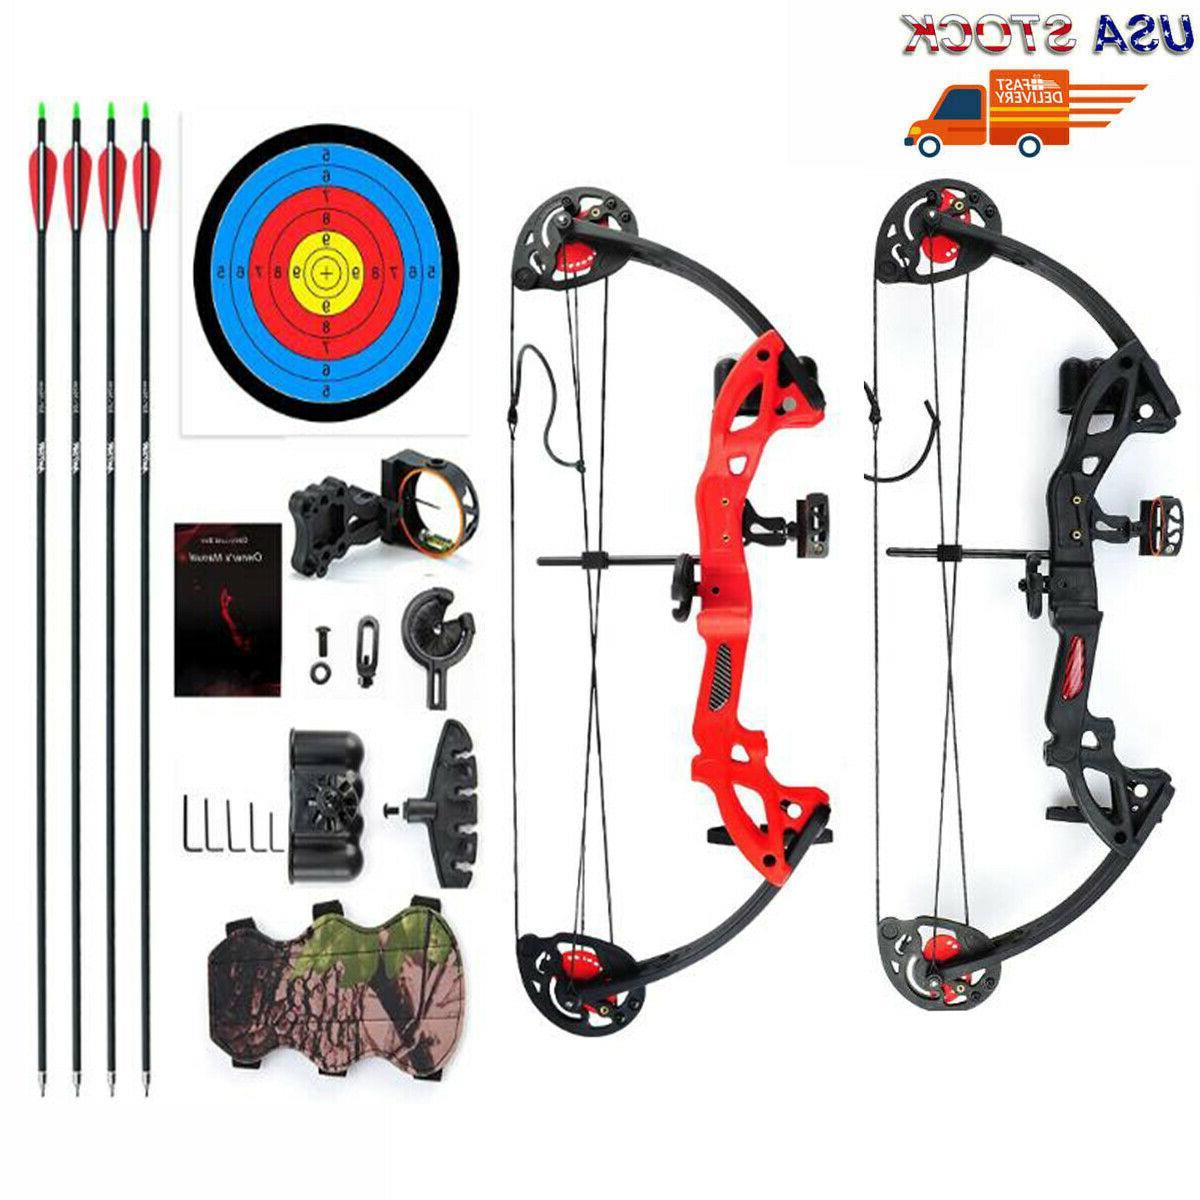 compound bow archery set arrows hunting 19